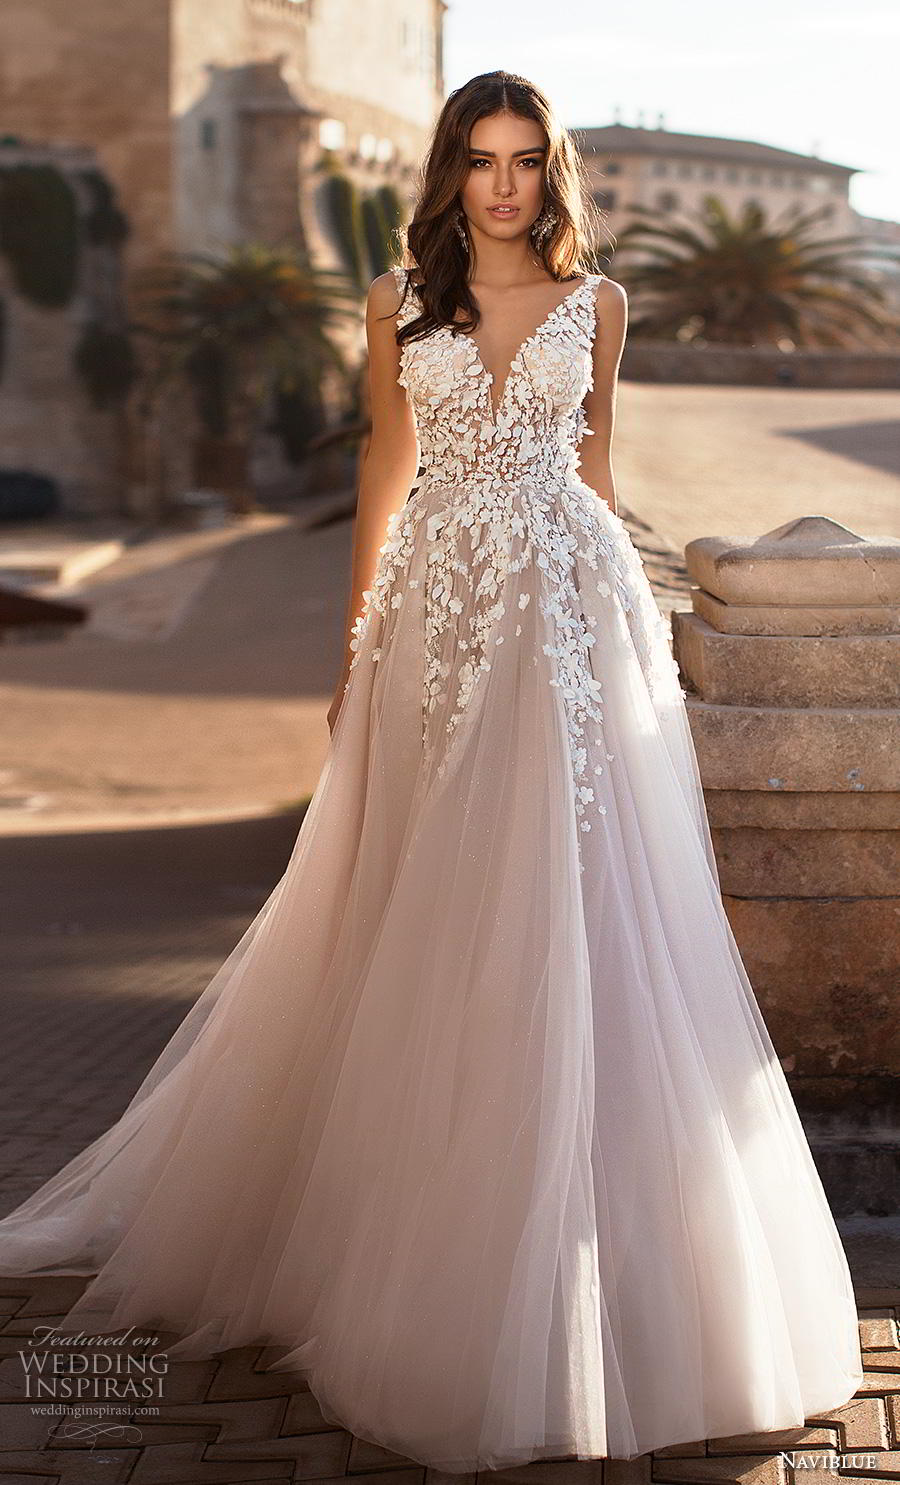 naviblue 2019 bridal sleeveless v neck heavily embellished bodice tulle skirt romantic blush a  line wedding dress backless sweep train (1) mv